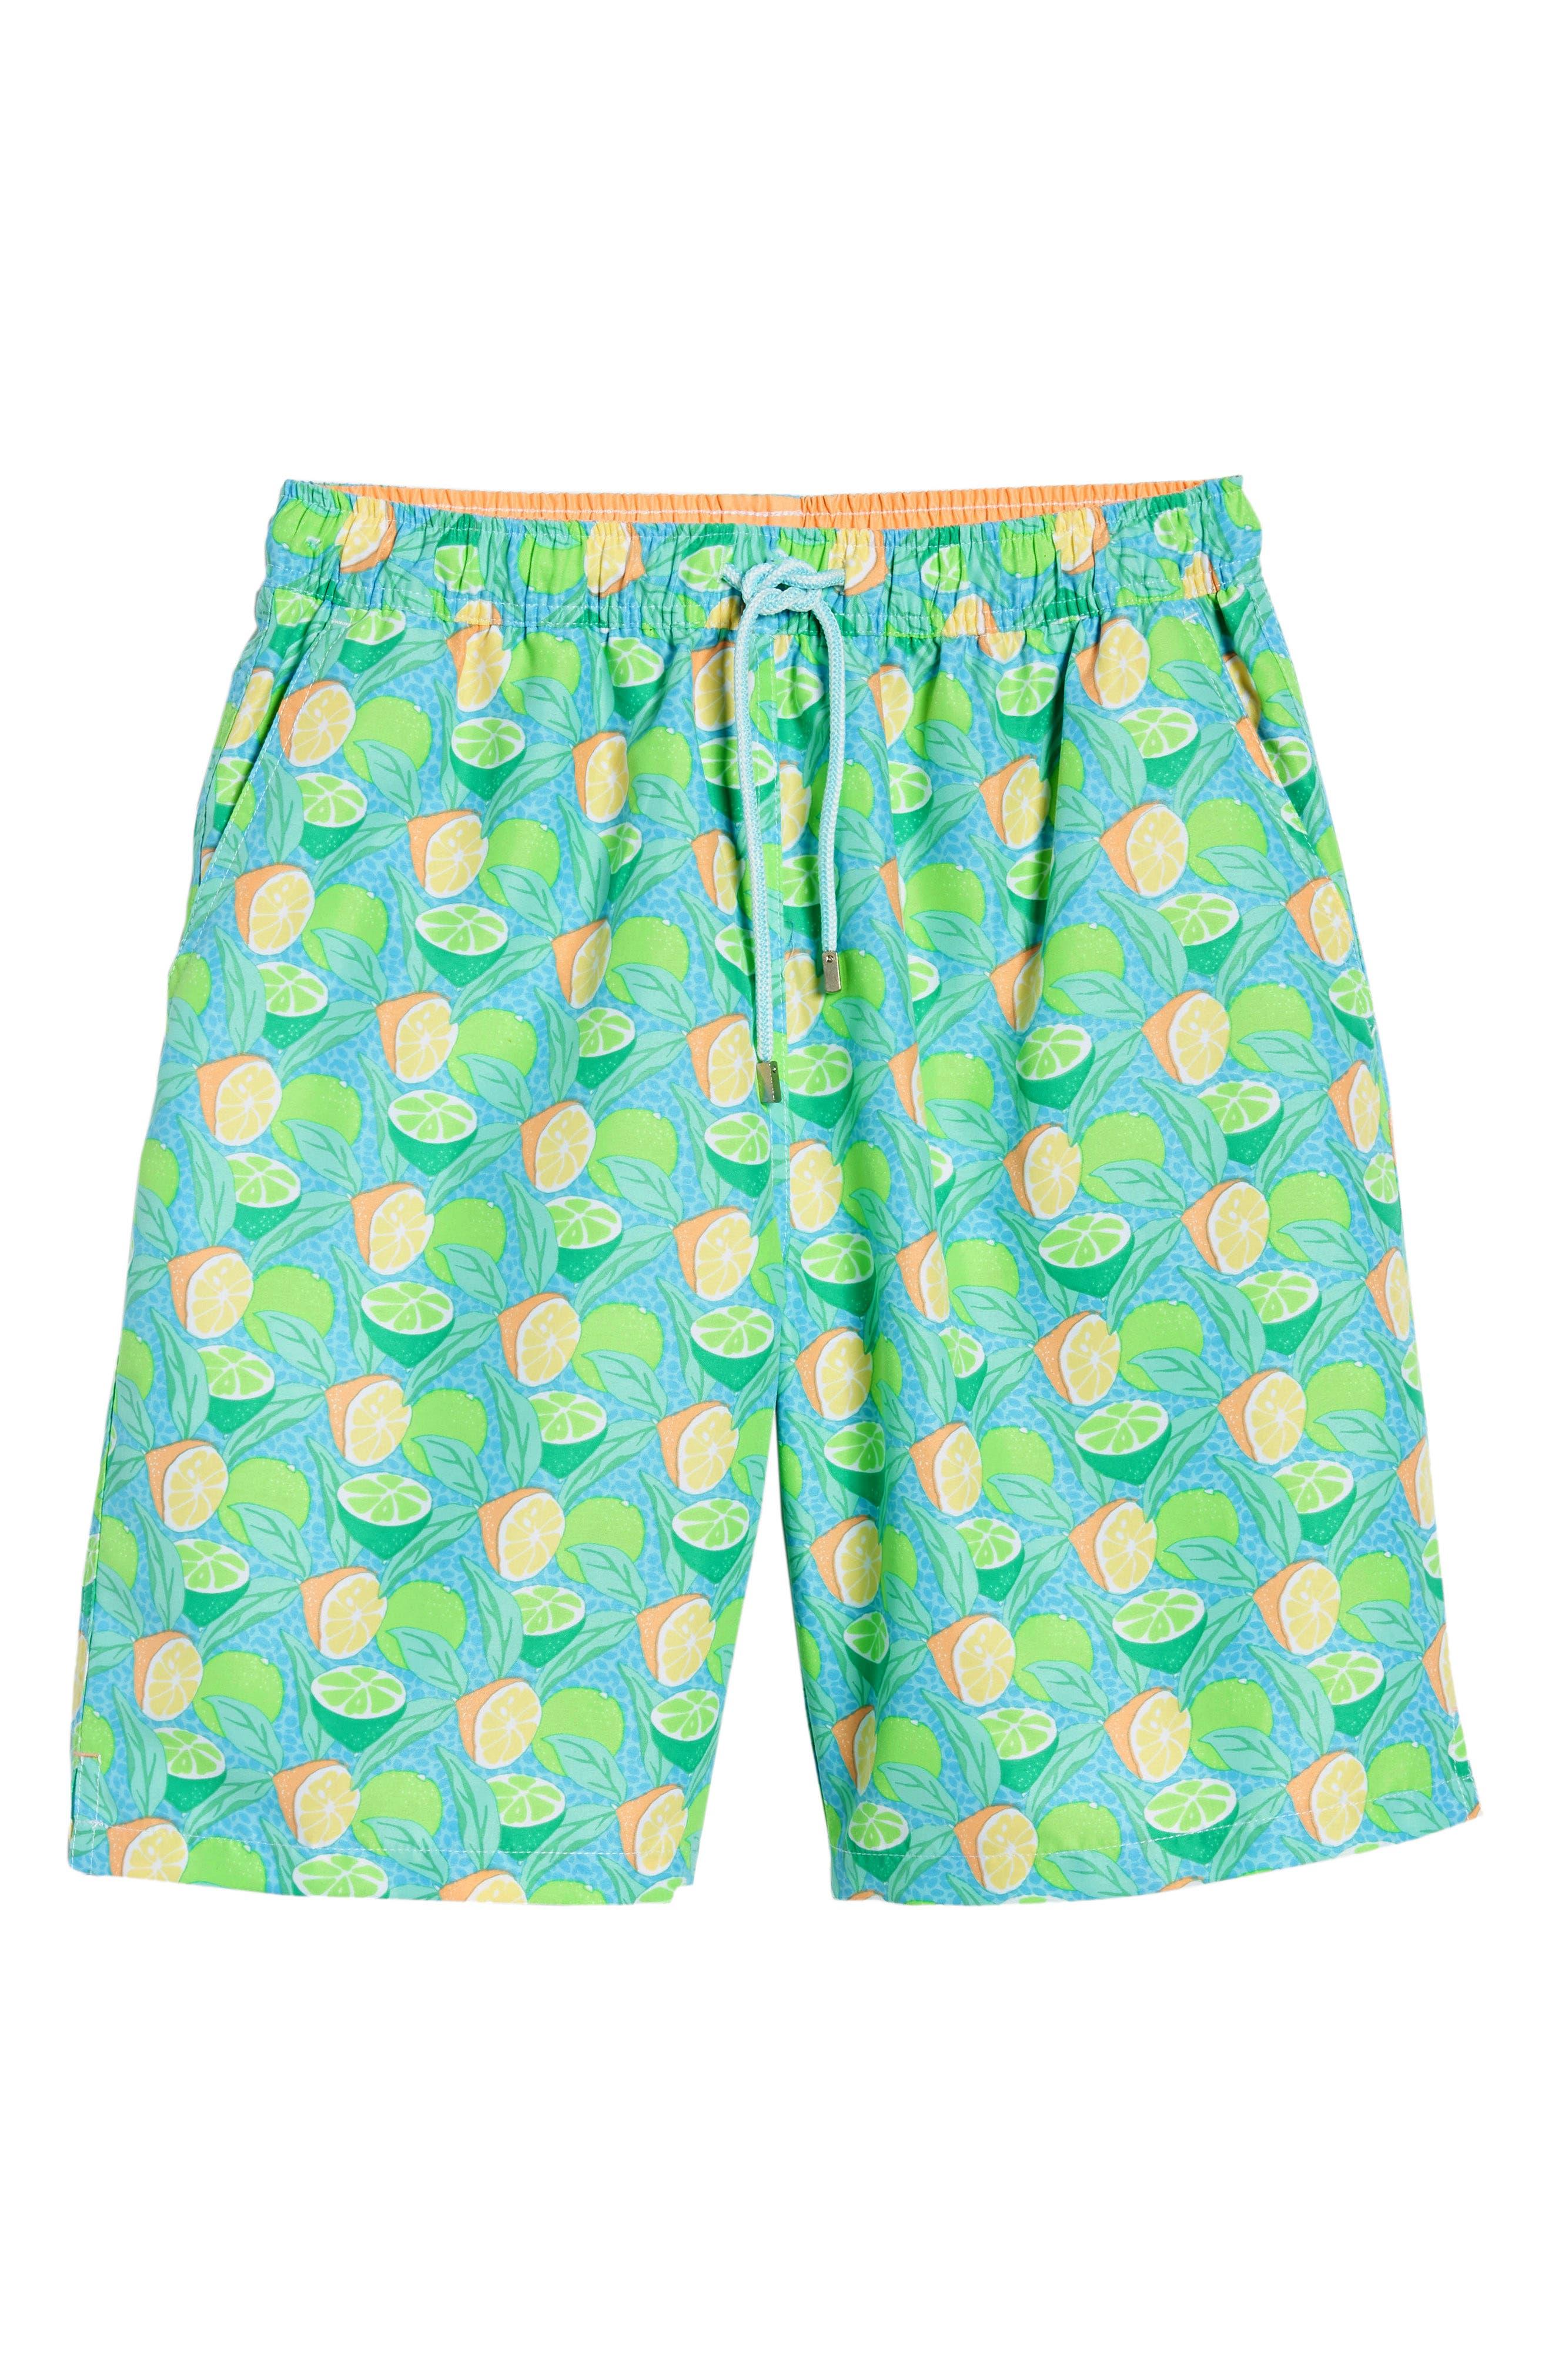 Sour Lemons Swim Trunks,                             Alternate thumbnail 6, color,                             Watercress